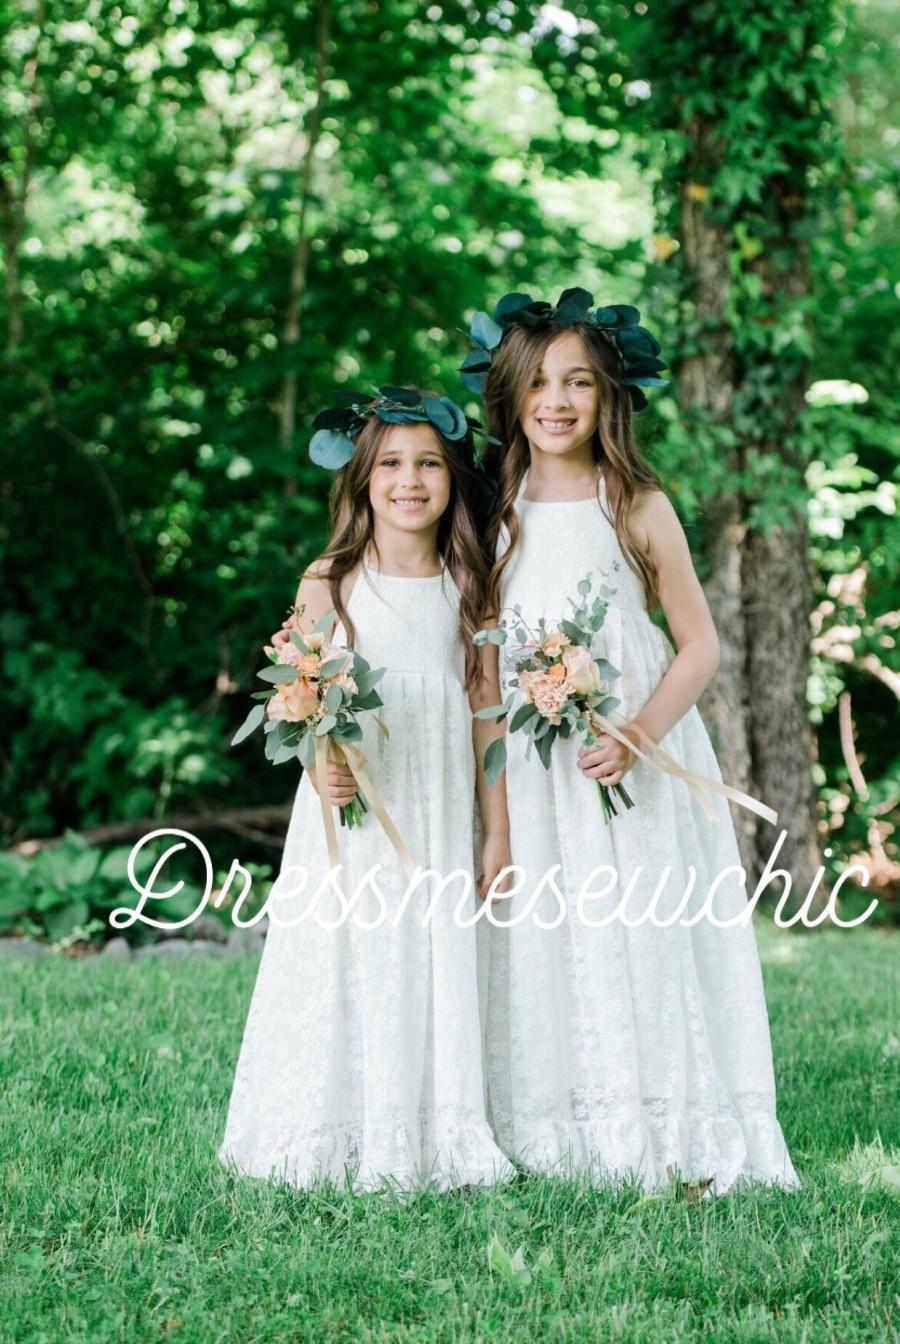 Wedding - 12T Halter flower girl, ivory girl lace dress, long lace gown, Bohemian dress, cowgirl, cowboy flower girl, beach wedding